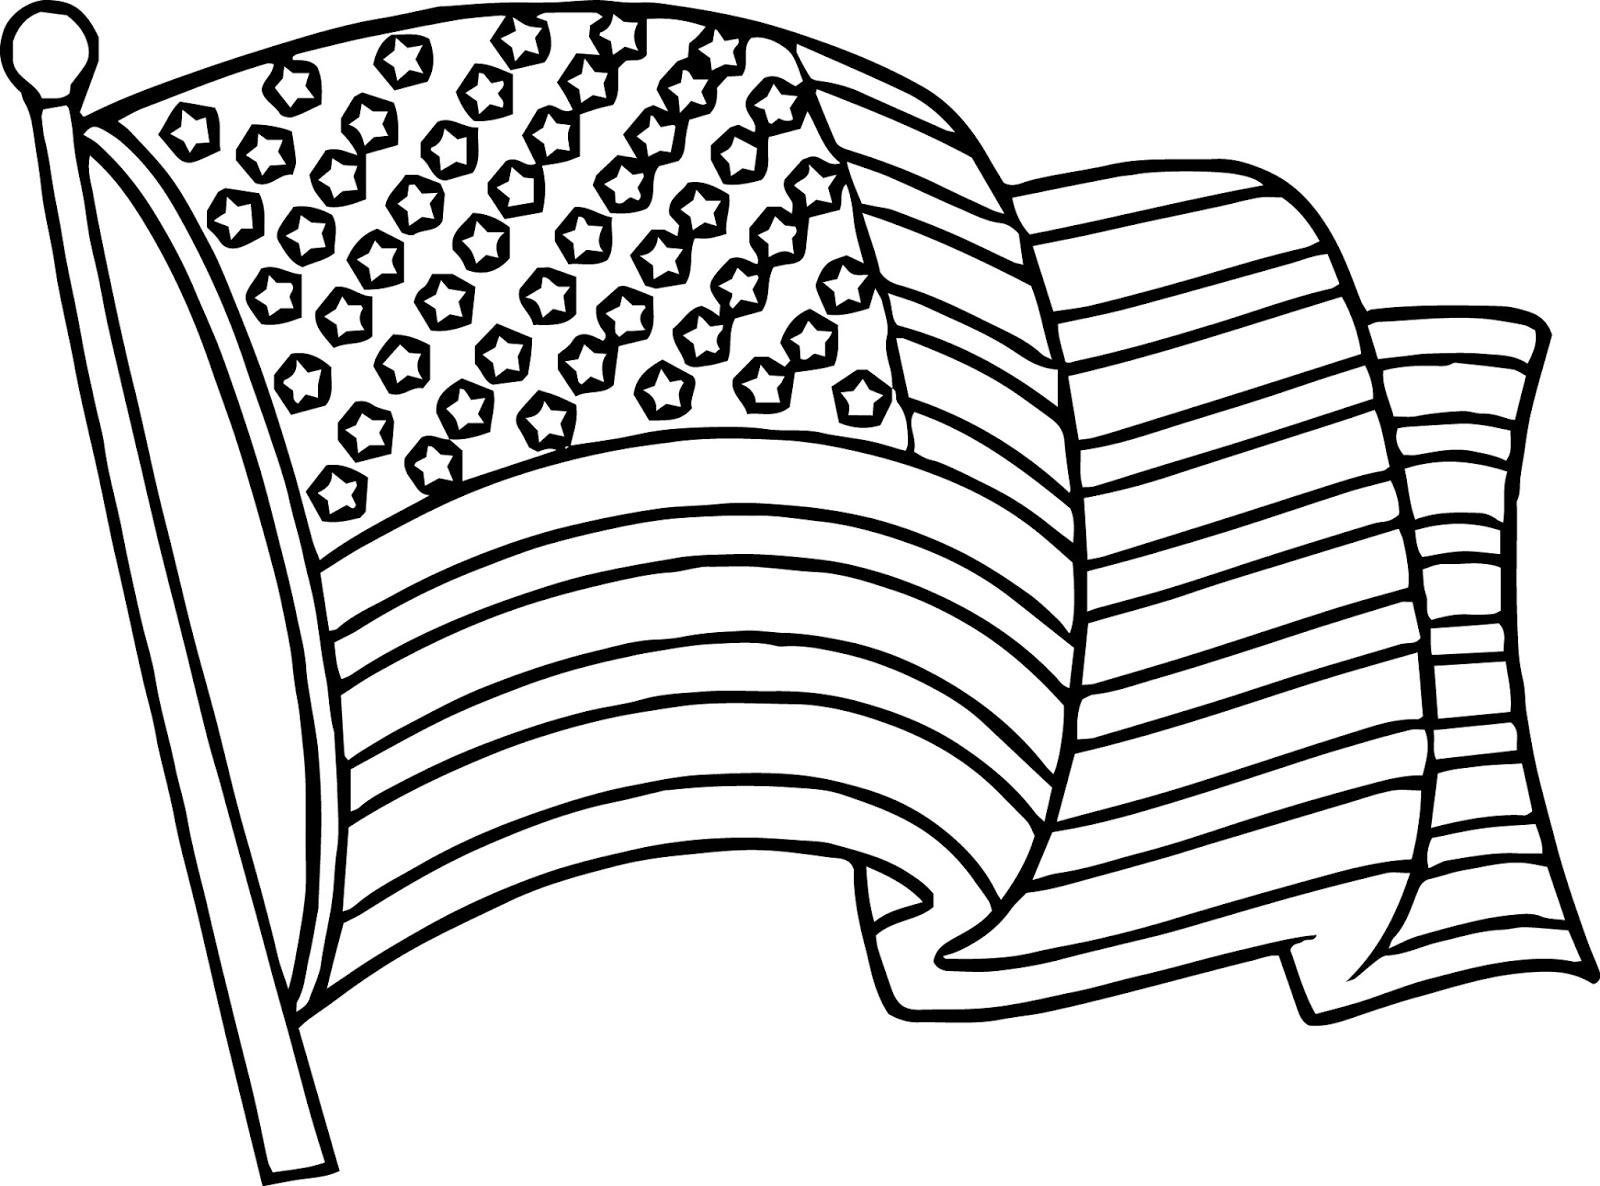 1600x1186 Unique Symbols Of The Usa Coloring Pages Ameri